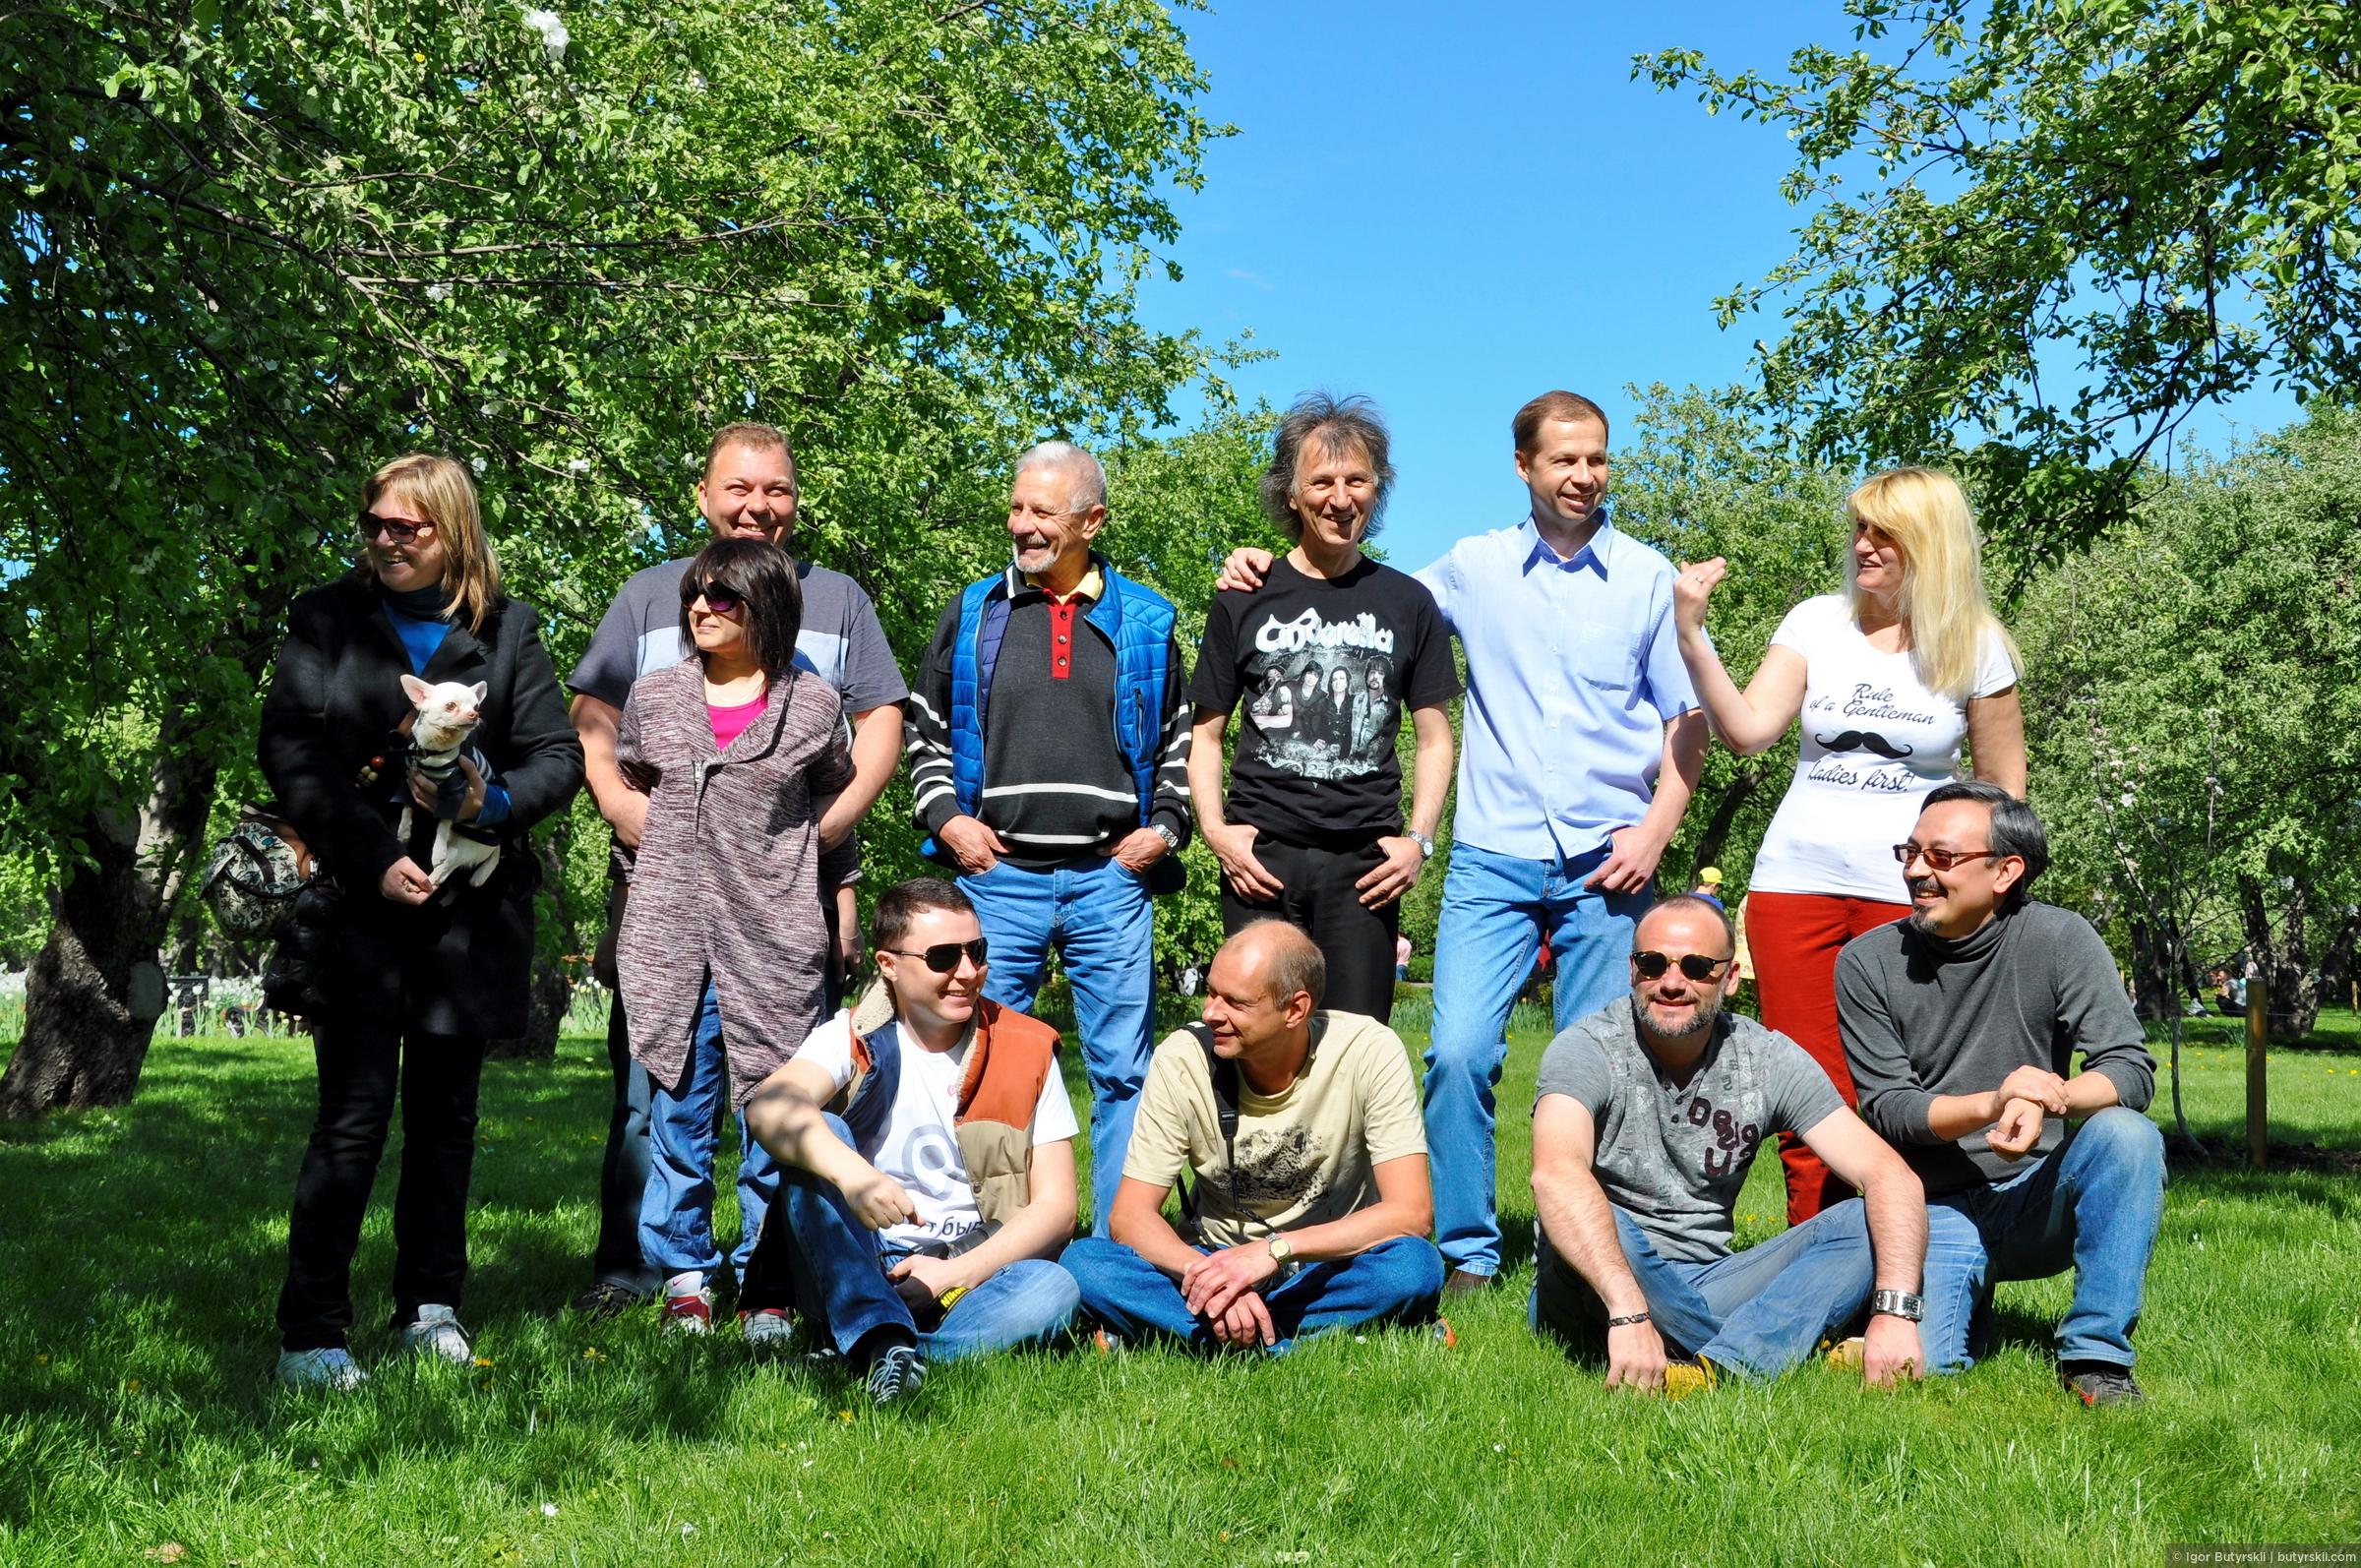 "Олег (<a href=""http://o-zhuravel.tourister.ru/"" target=""_blank"" class=""ext_link""><strong>O-zhuravel</strong></a>), Света, Юрий (<a href=""http://yurijvar.tourister.ru/"" target=""_blank"" class=""ext_link""><strong>Yurijvar</strong></a>) с женой, Владимир (<a href=""http://violik.tourister.ru/"" target=""_blank"" class=""ext_link""><strong>Violik</strong></a>), Игорь (<a href=""http://www.tourister.ru/users/Igor_Evseev"" target=""_blank"" class=""ext_link""><strong>Igor_Evseev</strong></a>), Анна (<a href=""http://l-ann.tourister.ru/"" target=""_blank"" class=""ext_link""><strong>L-ann</strong></a>), Максим (<a href=""http://maksim-nav.tourister.ru/"" target=""_blank"" class=""ext_link""><strong>Maksim-nav</strong></a>), Олег (<a href=""http://nomad.tourister.ru/"" target=""_blank"" class=""ext_link""><strong>Nomad</strong></a>), Виктор (<a href=""http://vbashkir.ru/"" target=""_blank"" class=""ext_link""><strong>Vibas</strong></a>), Альберт, Туристер встреча-2016 в Коломенском"